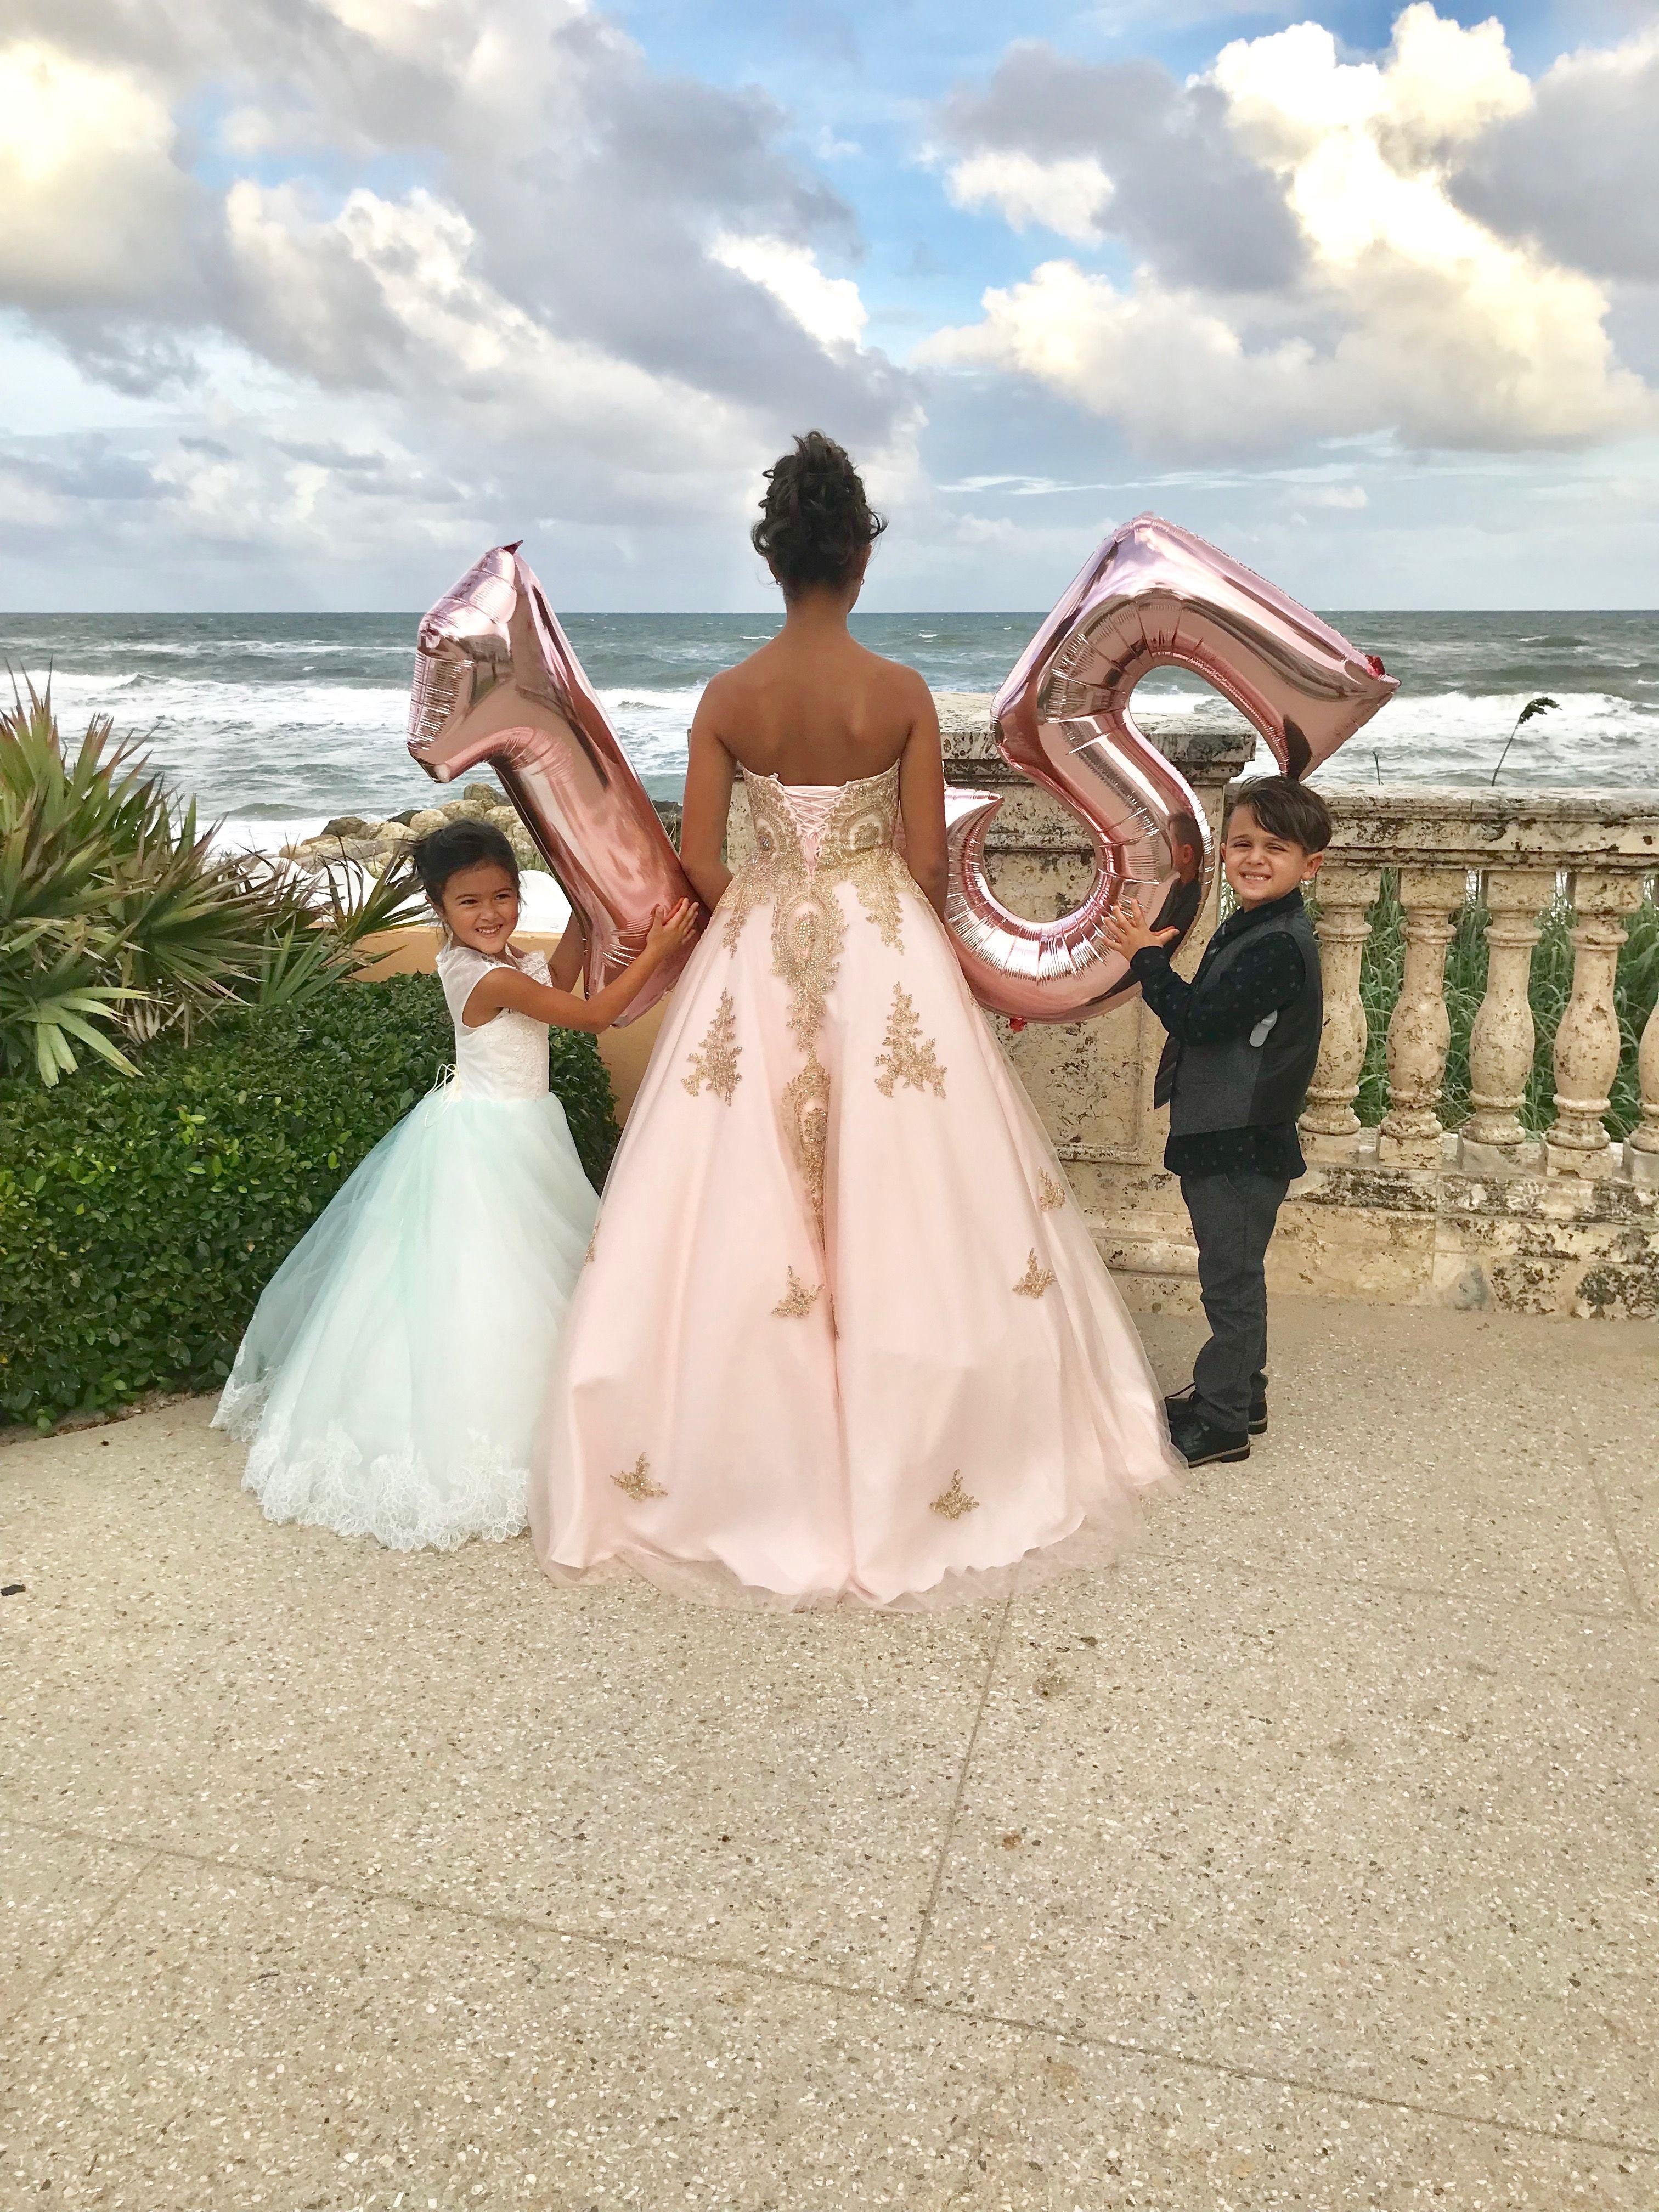 Kandi burruss wedding dress  nataliiaverteletska  Quince  Pinterest  Quinceanera ideas Sweet